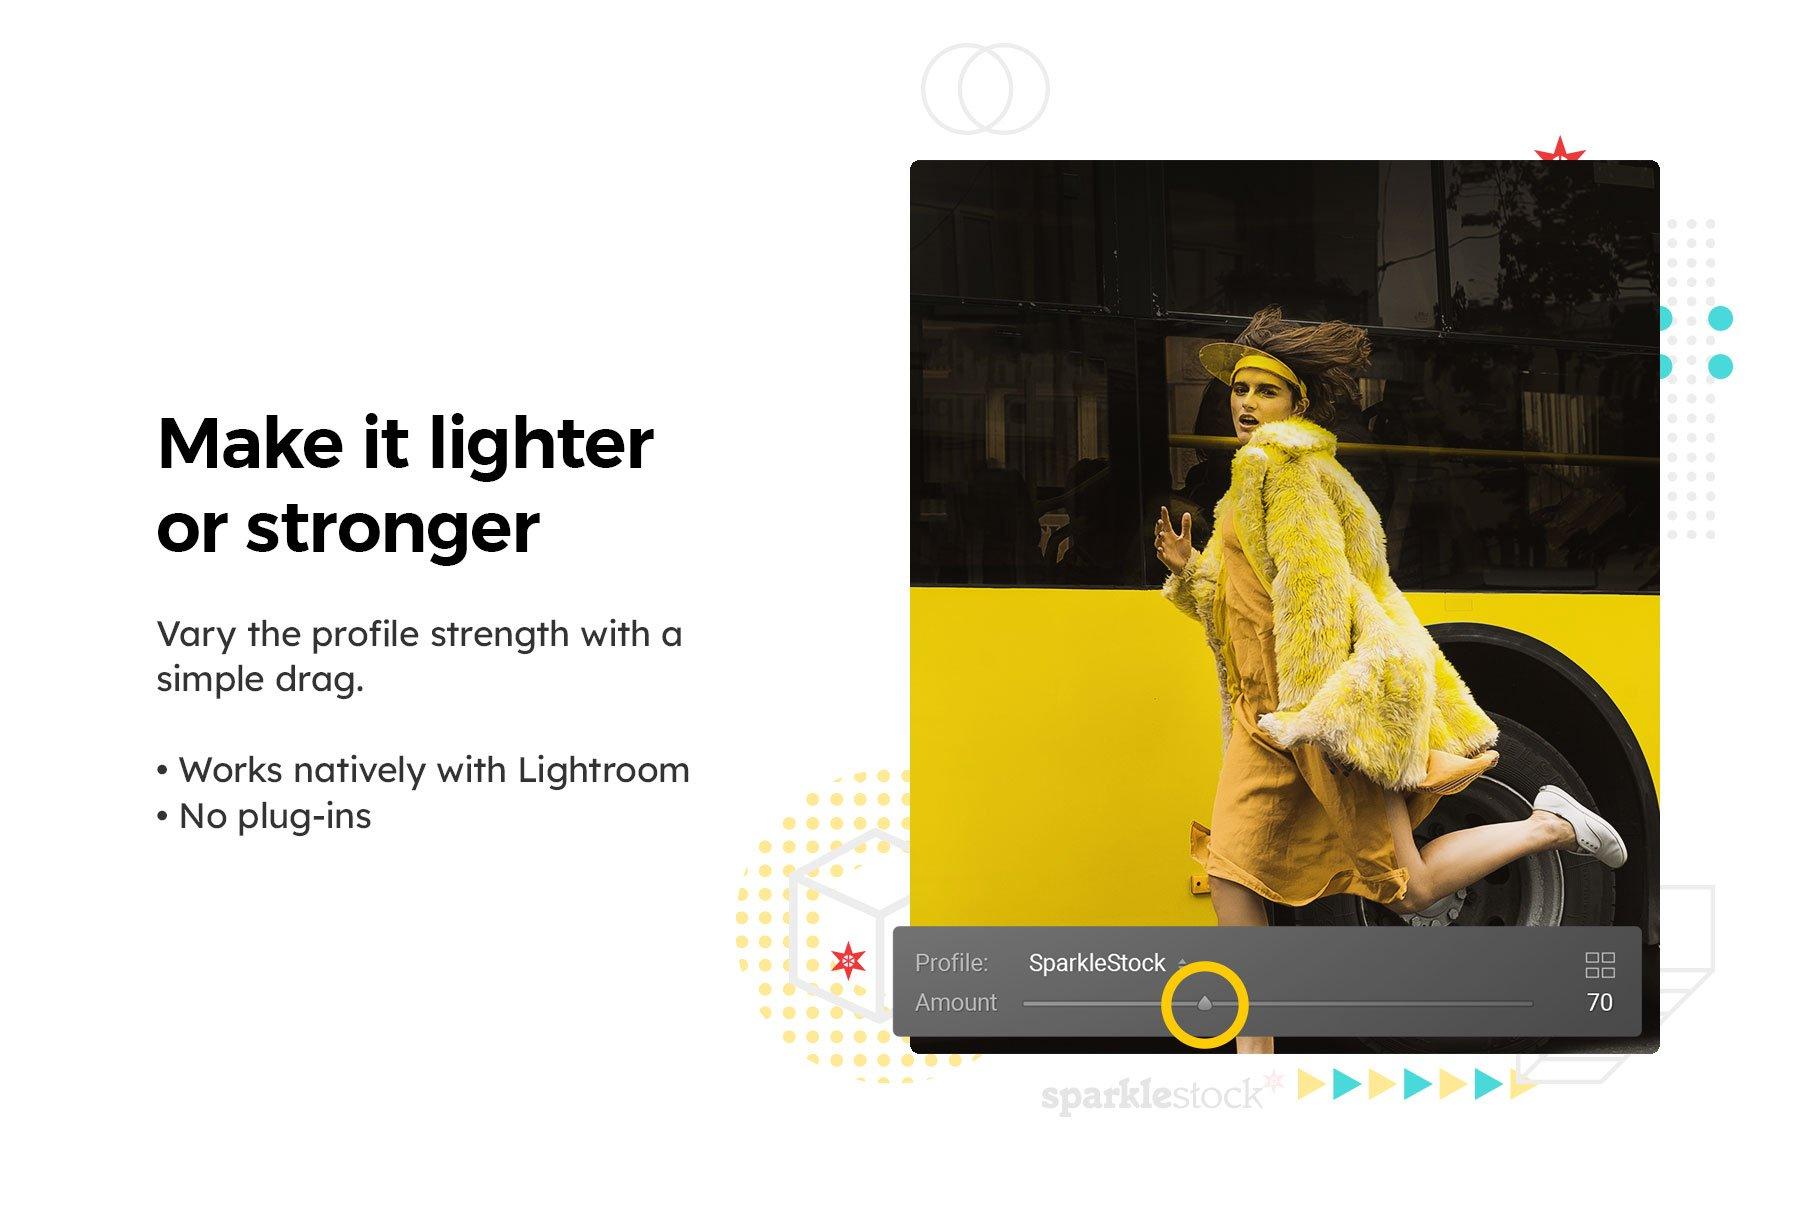 20款灰黄色调照片处理特效LR预设模板 20 Illuminating Yellow LR Presets插图6